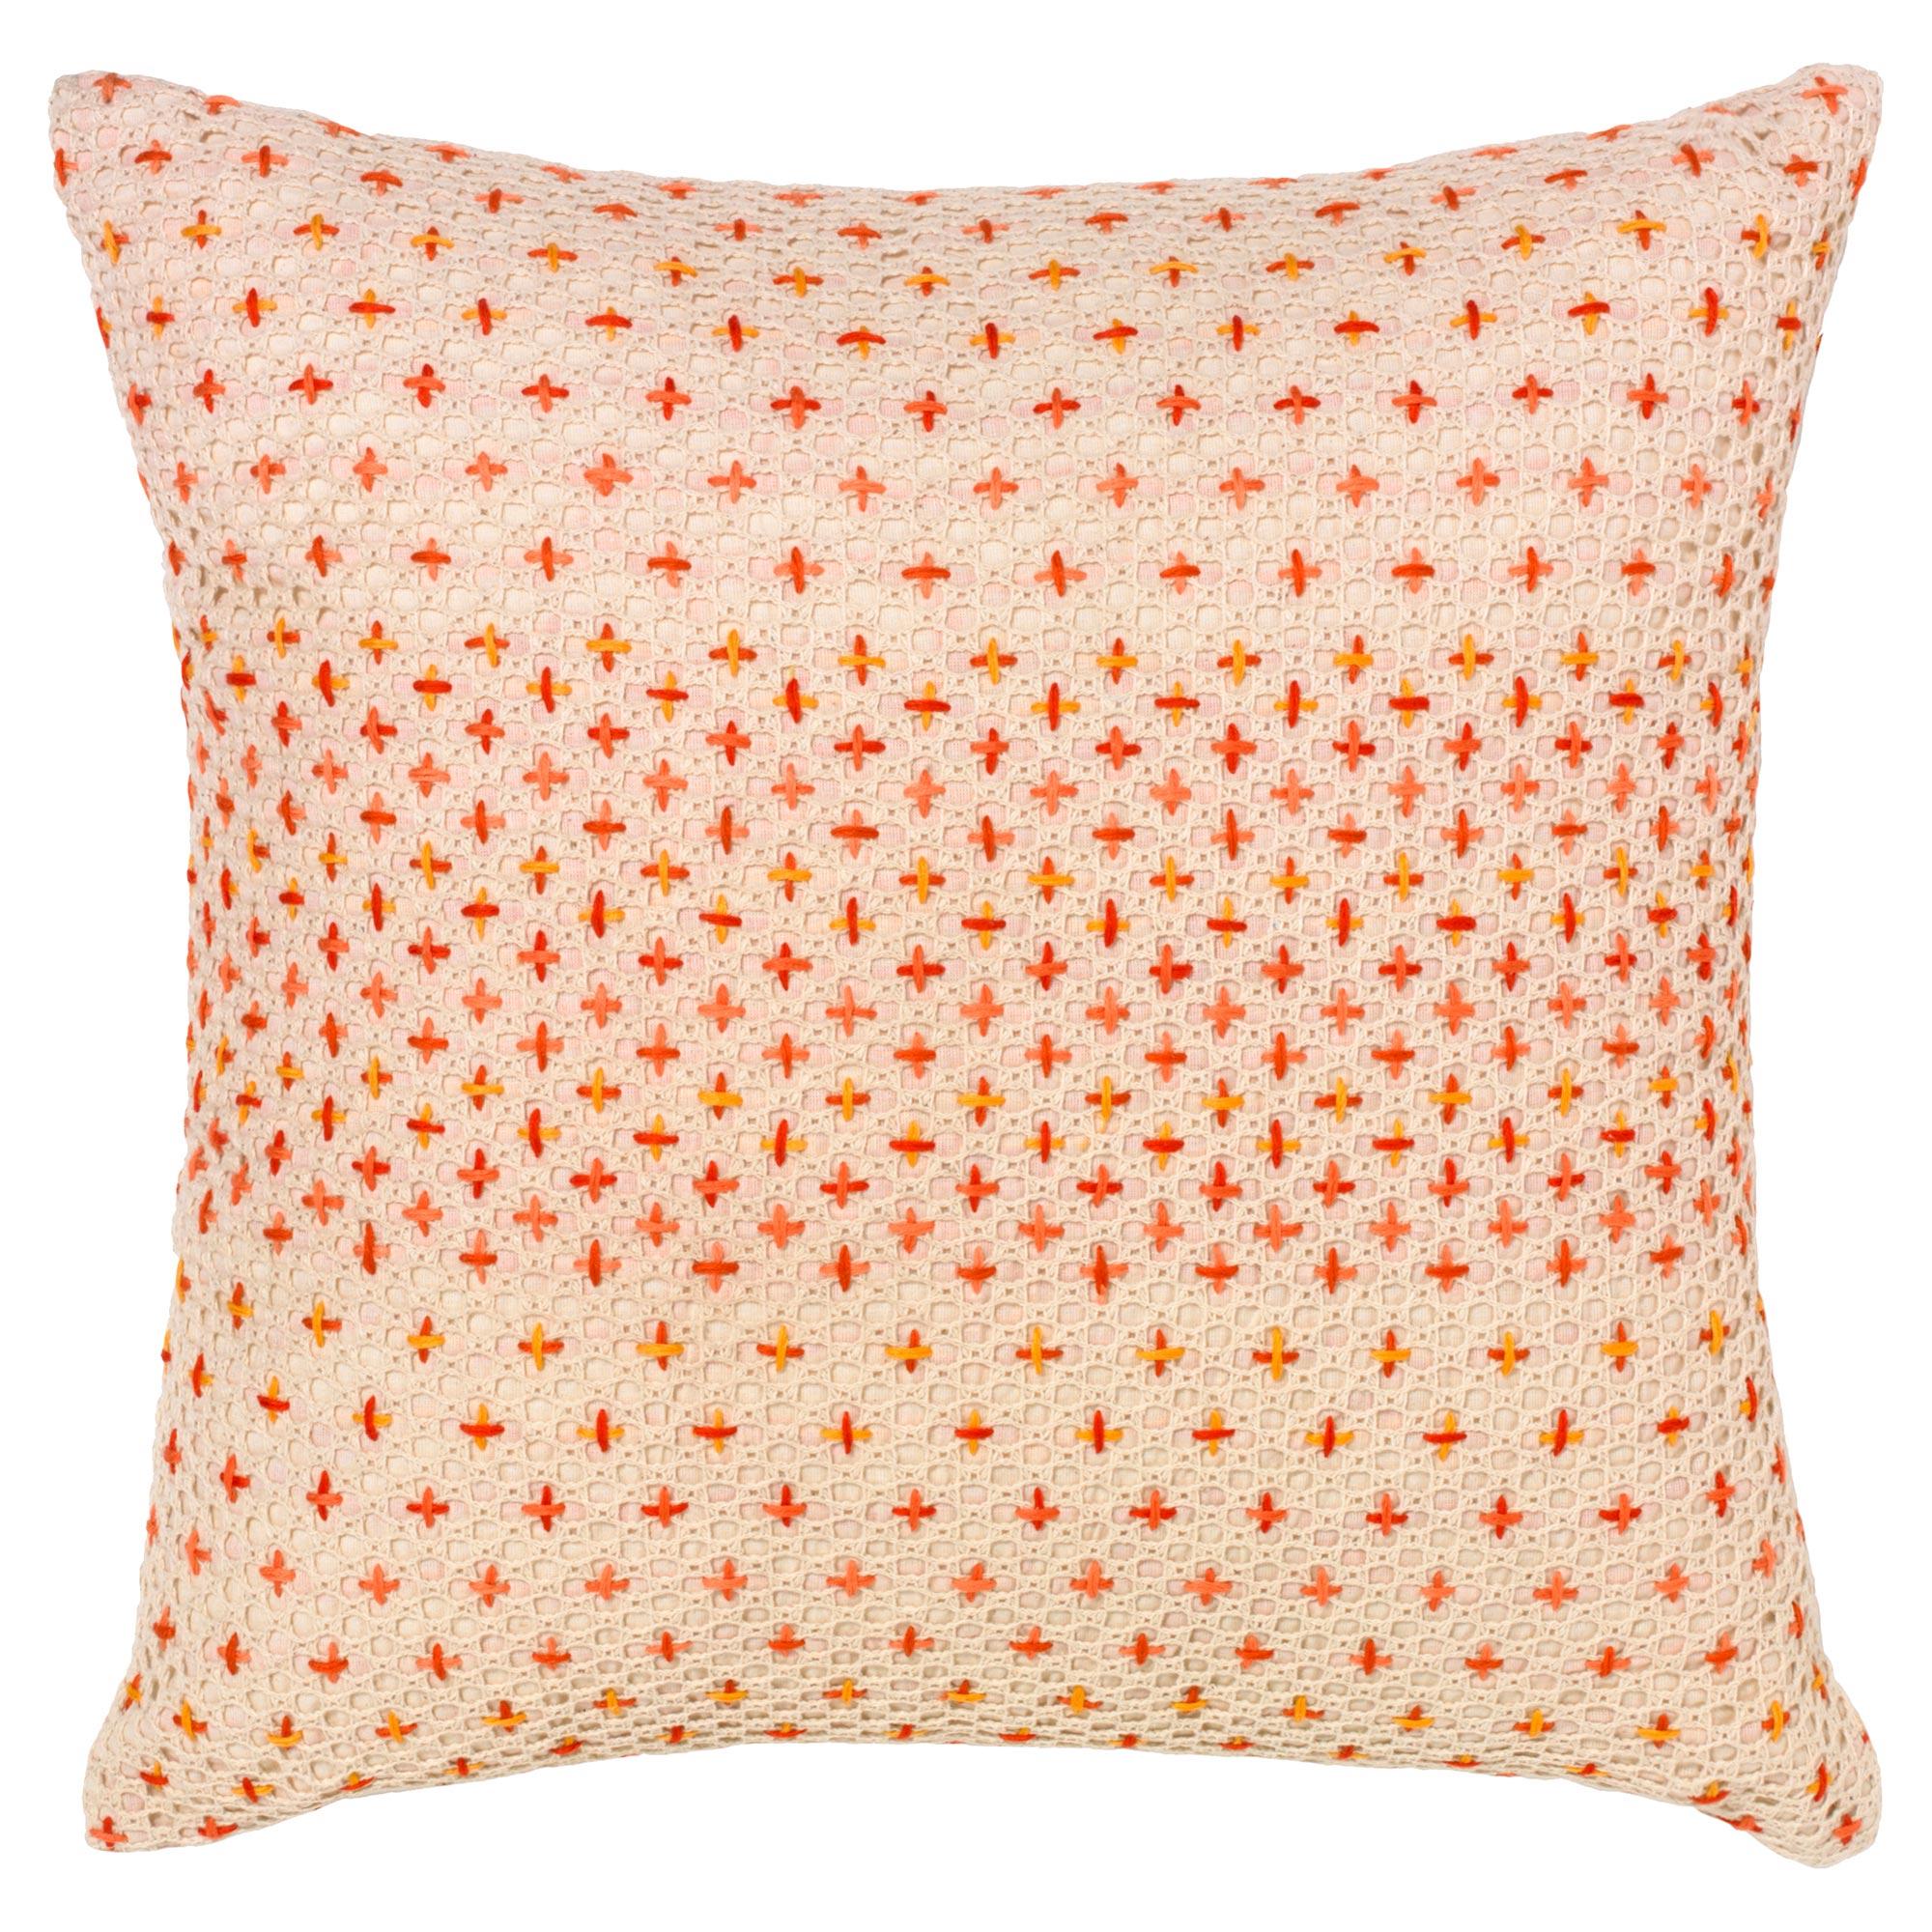 Felipa Modern Coral Cross Stitch Pillow - 18x18